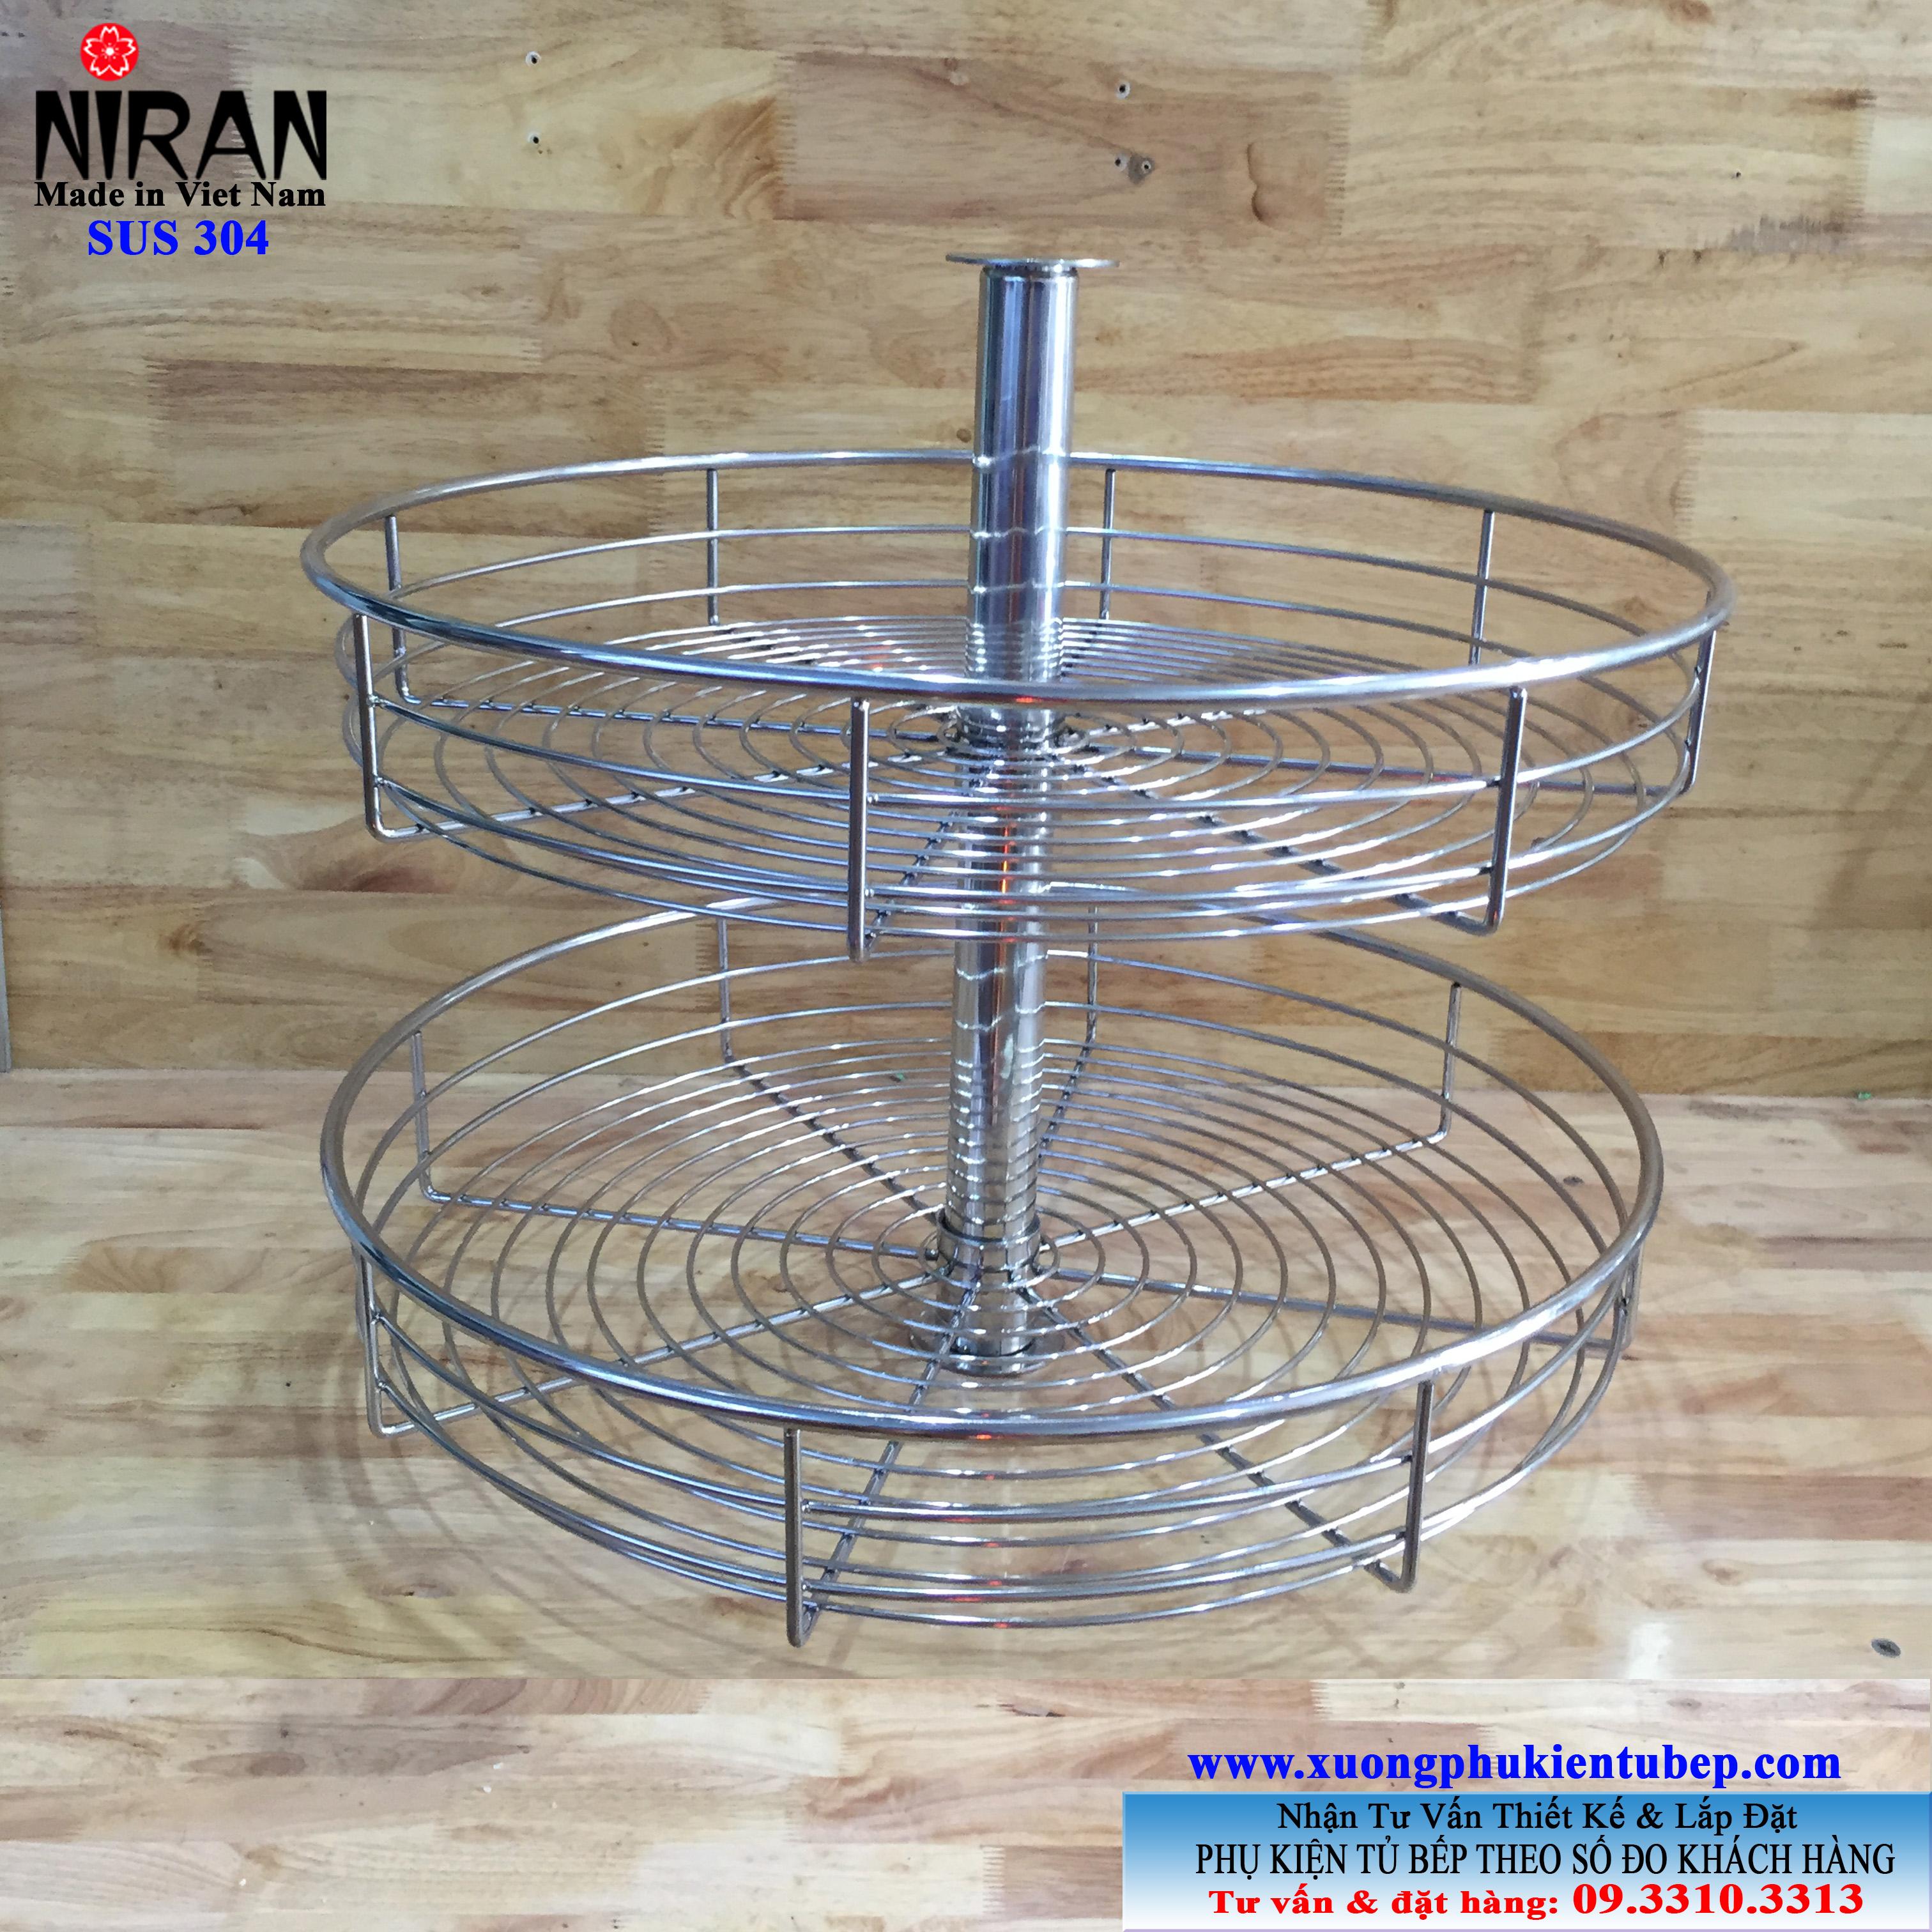 Mâm xoay tròn inox 304 Niran NR0701